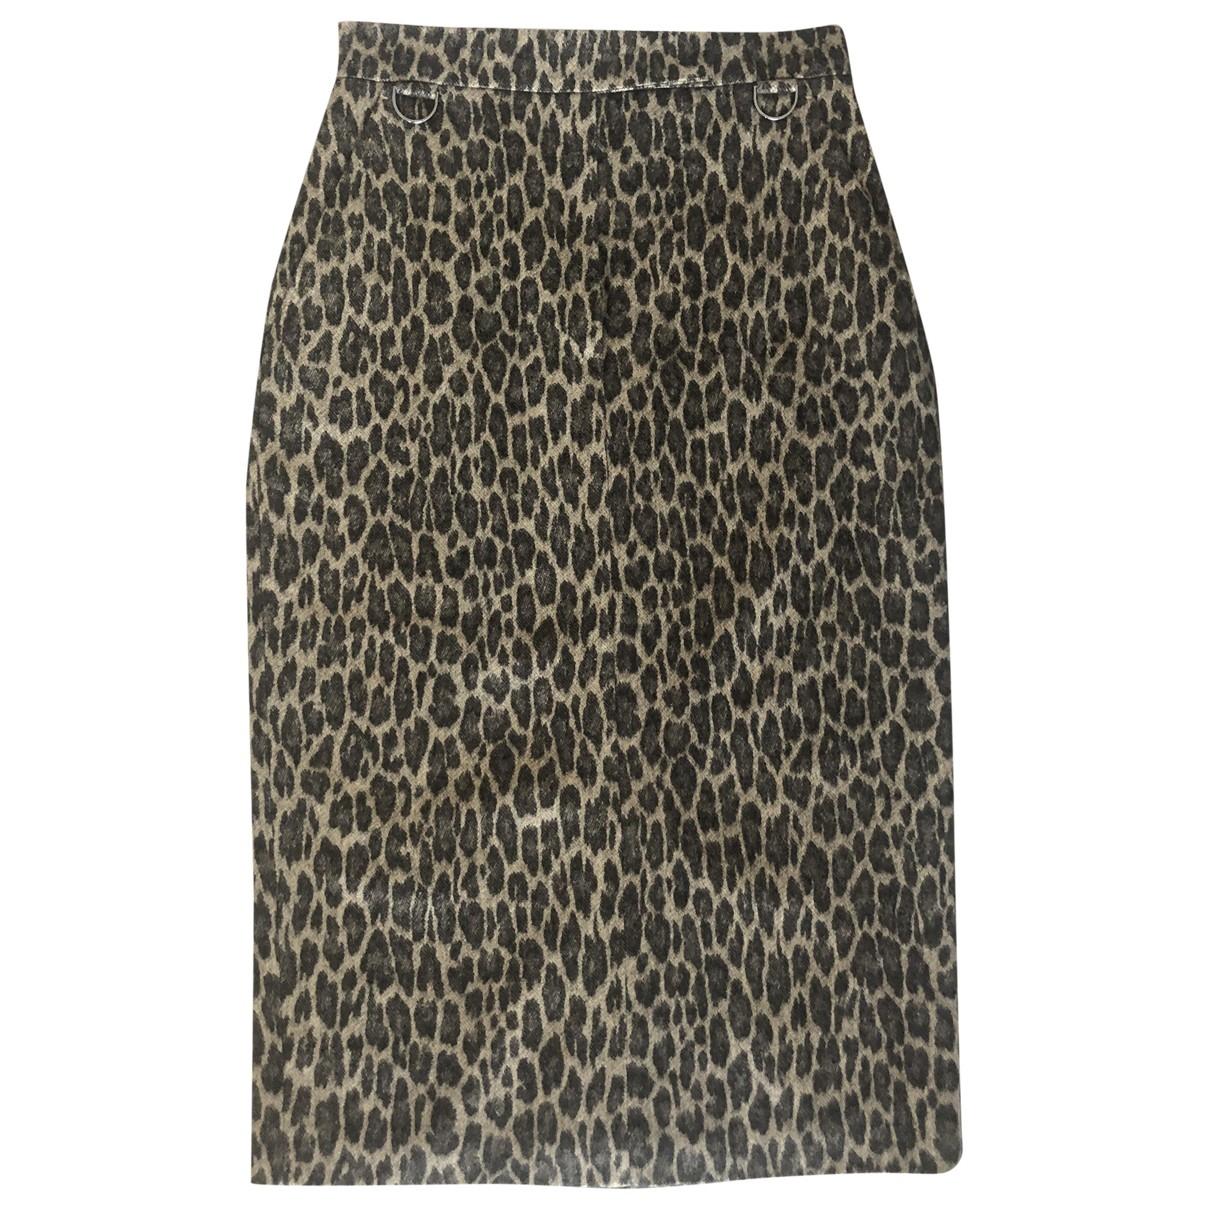 Max Mara \N Beige Wool skirt for Women 40 IT